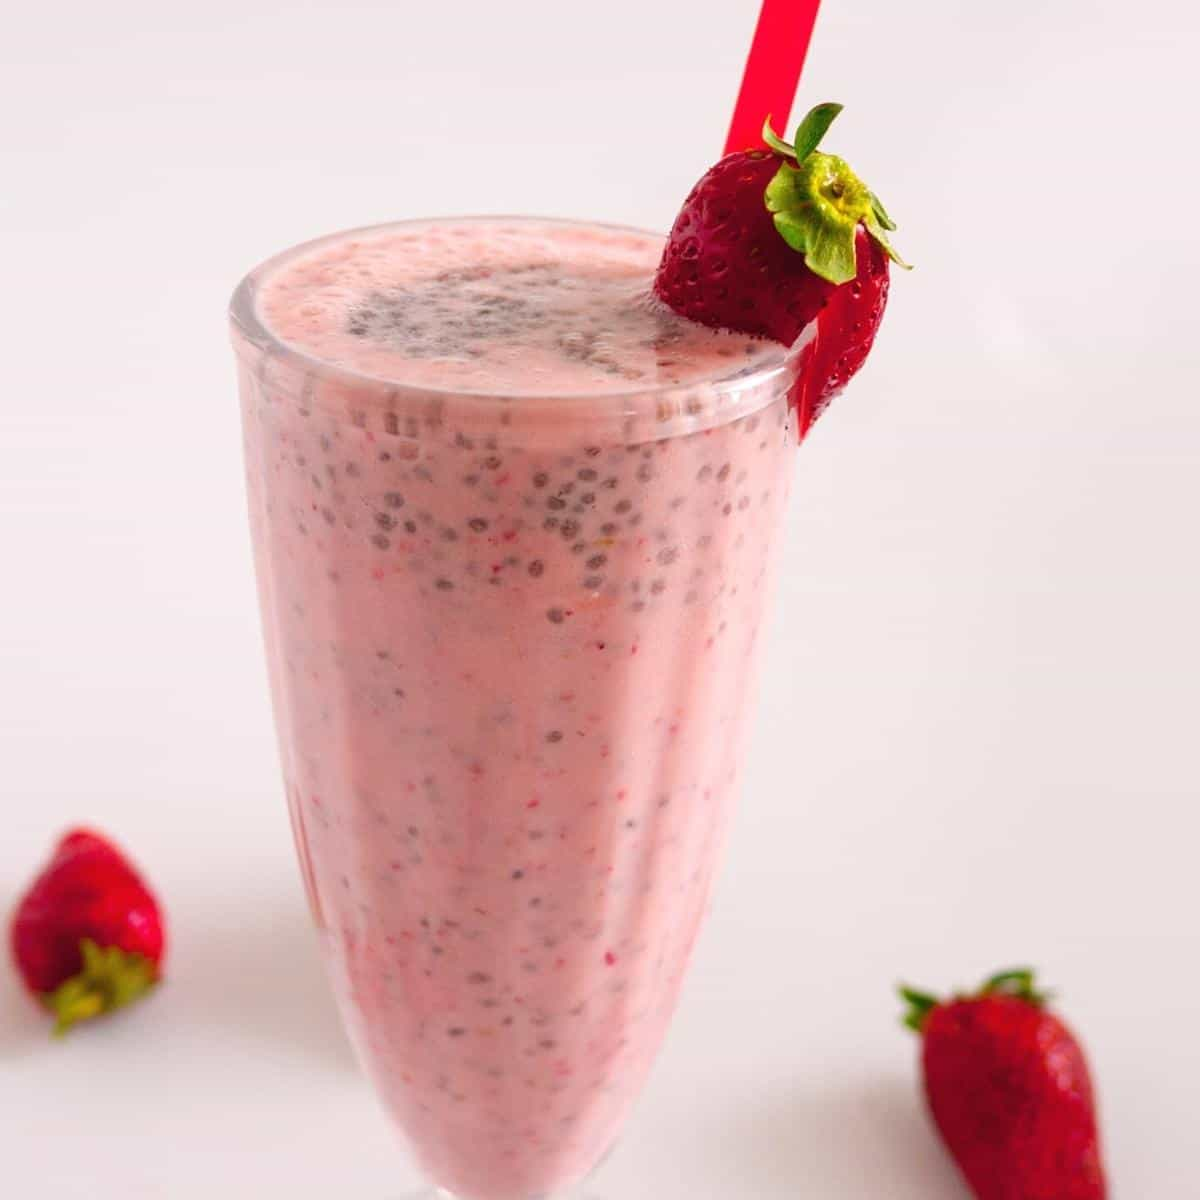 A milkshake glass with strawberries and banana